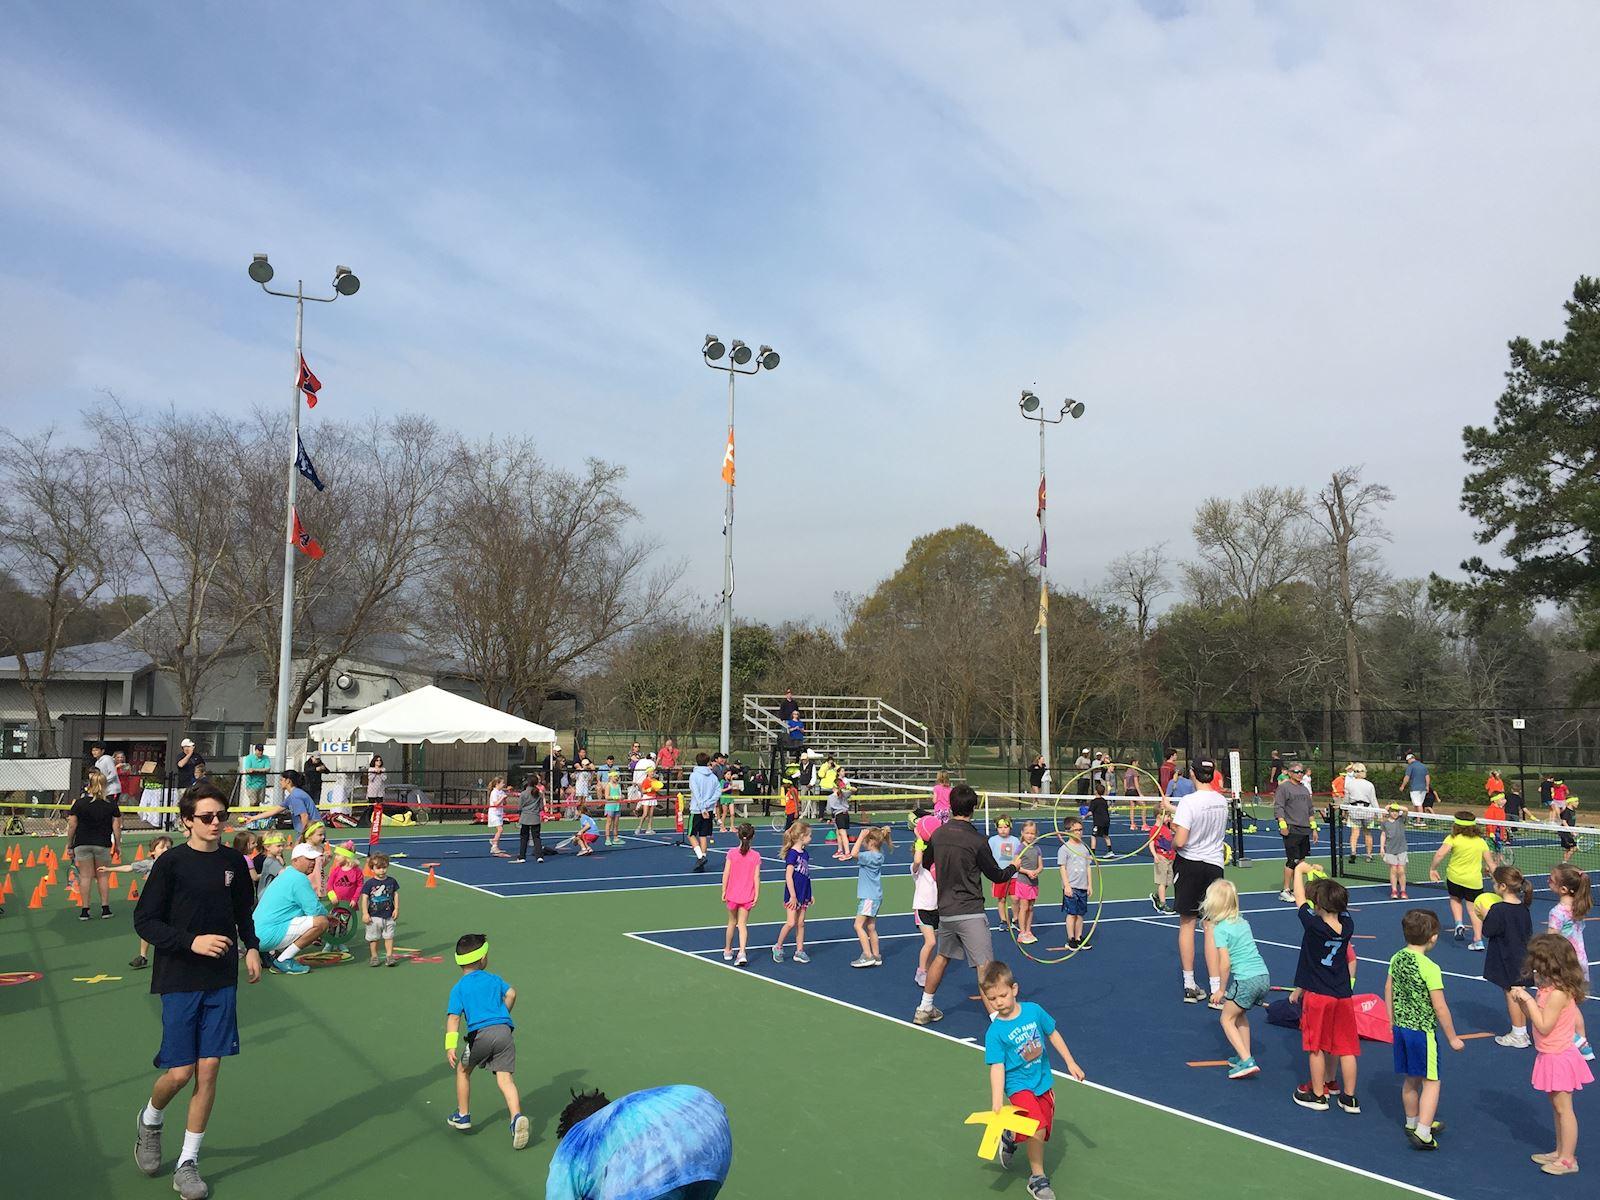 Lagoon Park Tennis Center